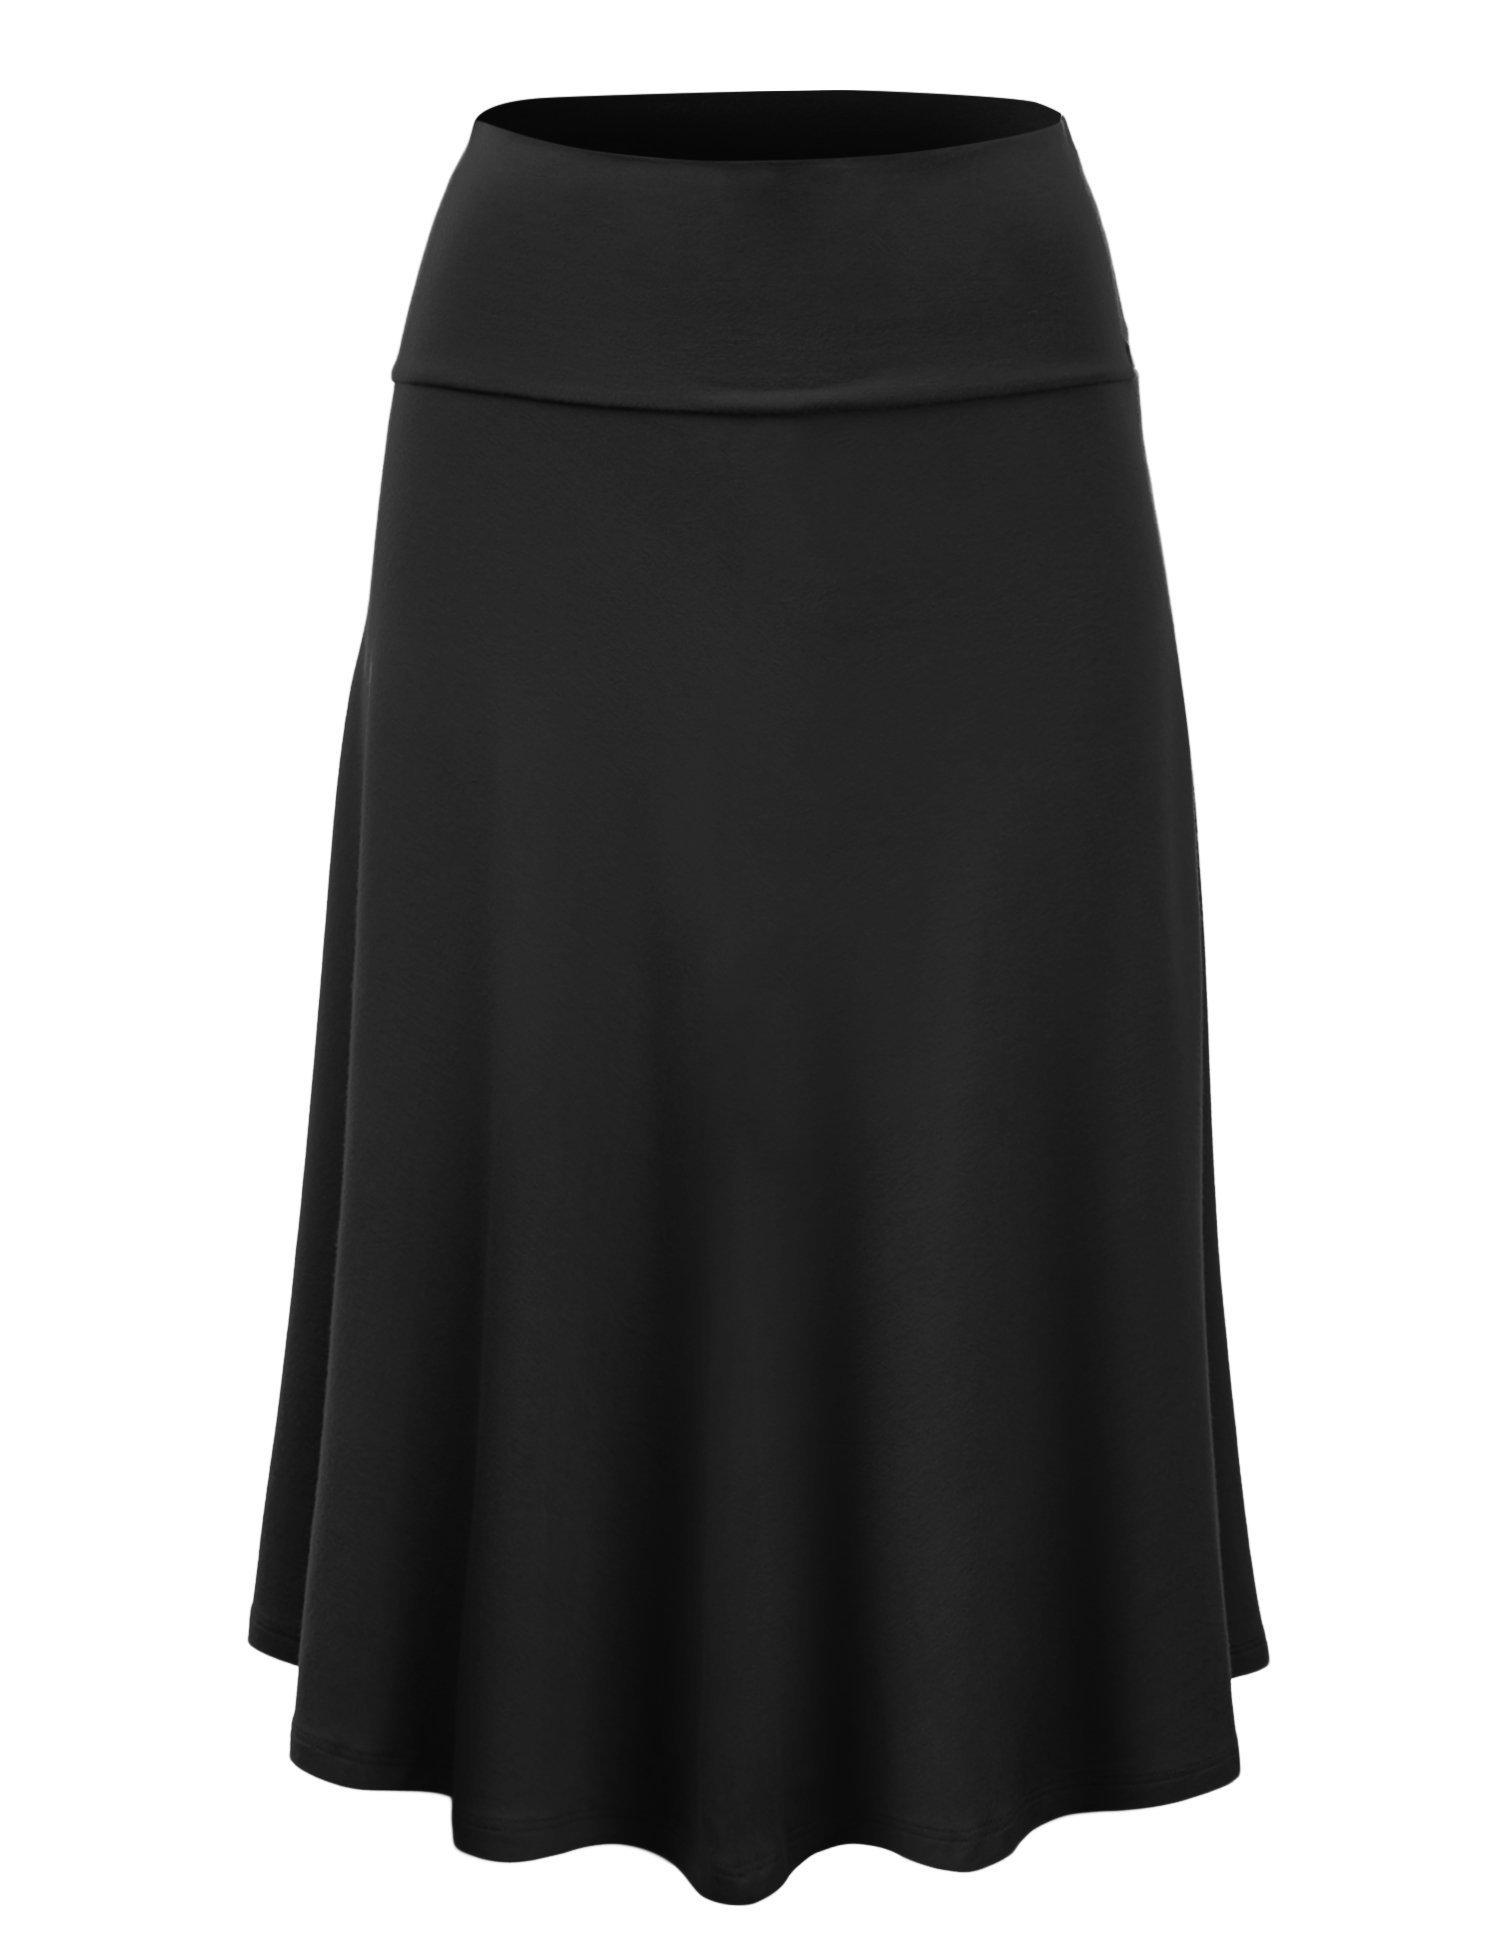 Lock and Love WB1105 Womens Lightweight Fold Over Flared Midi Skirt XL Black